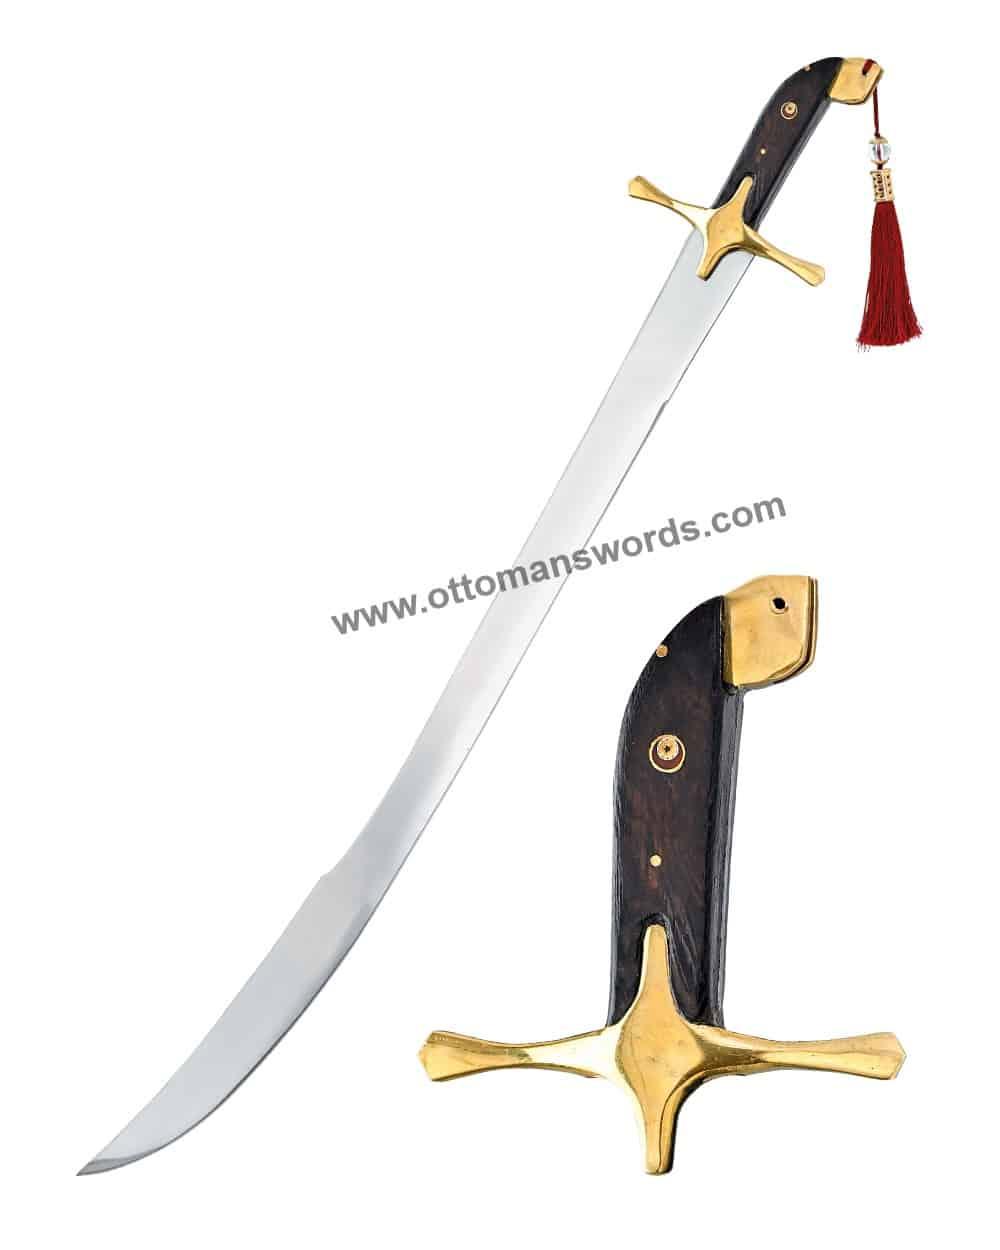 Customizable Sultan Alaaddin Sword - Sultan Alaaddin Sword